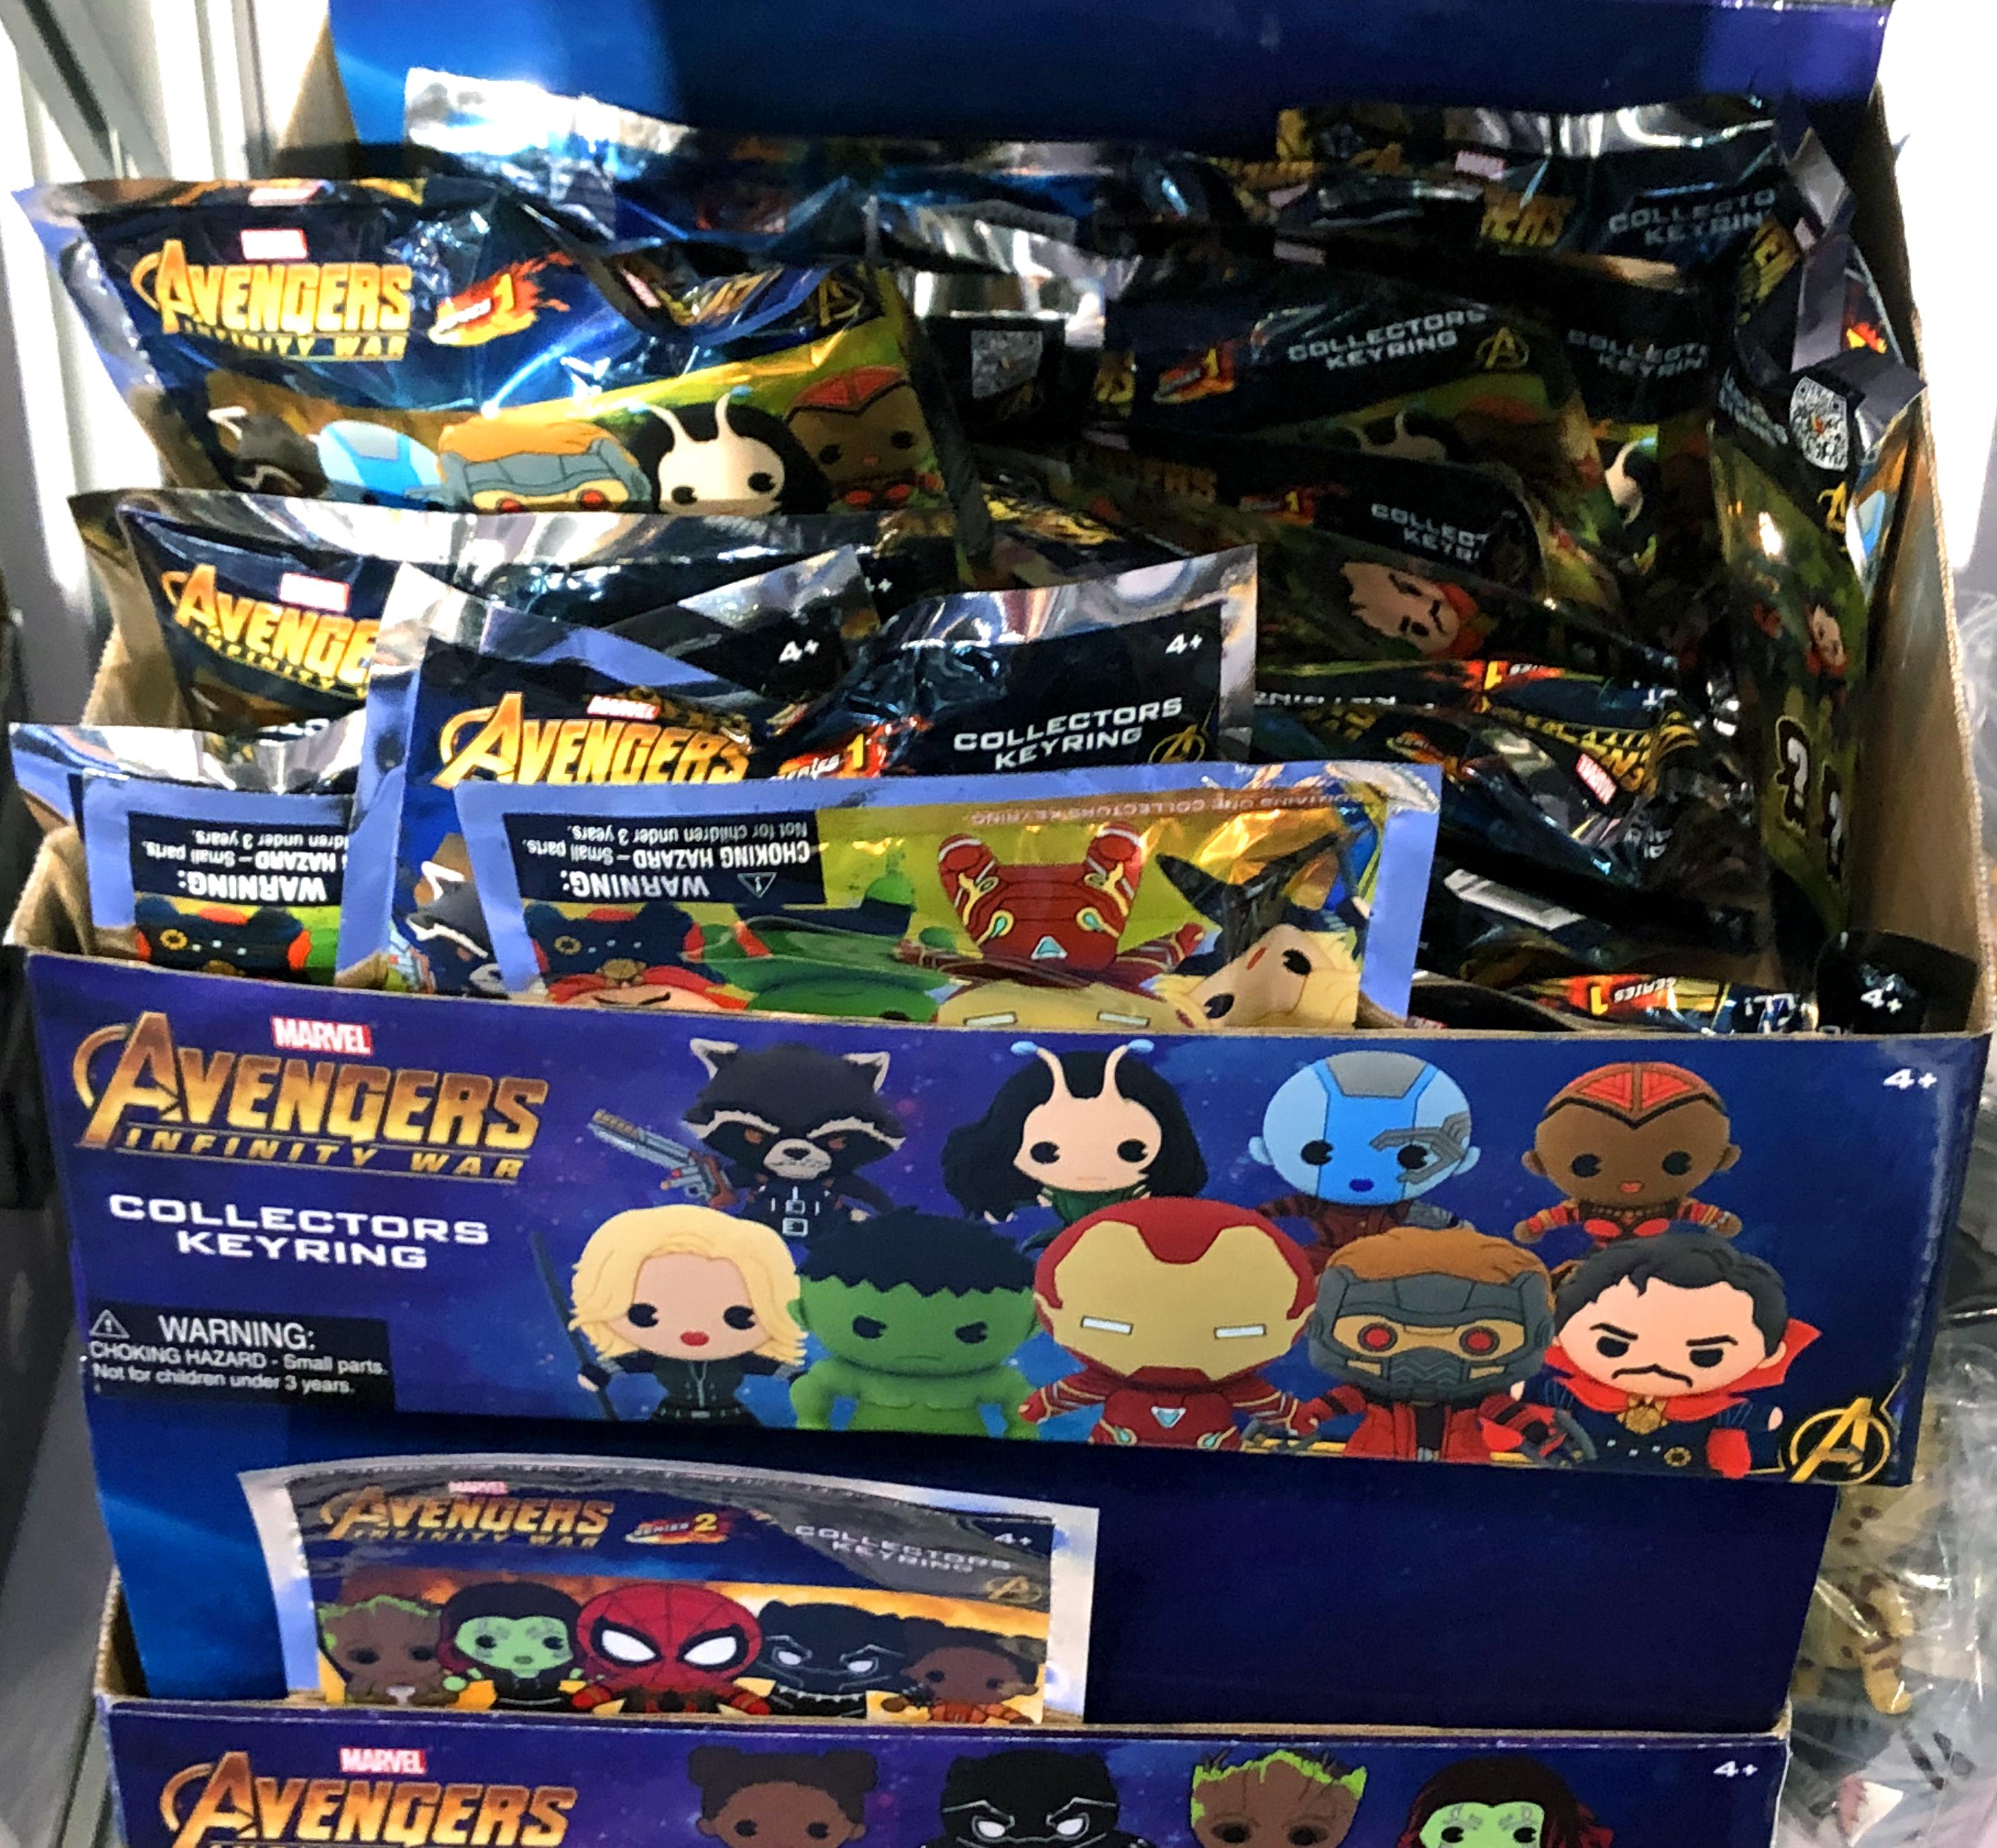 2018 Toy Fair Monogram International Avengers Infinity War Collectors Keyrings 02